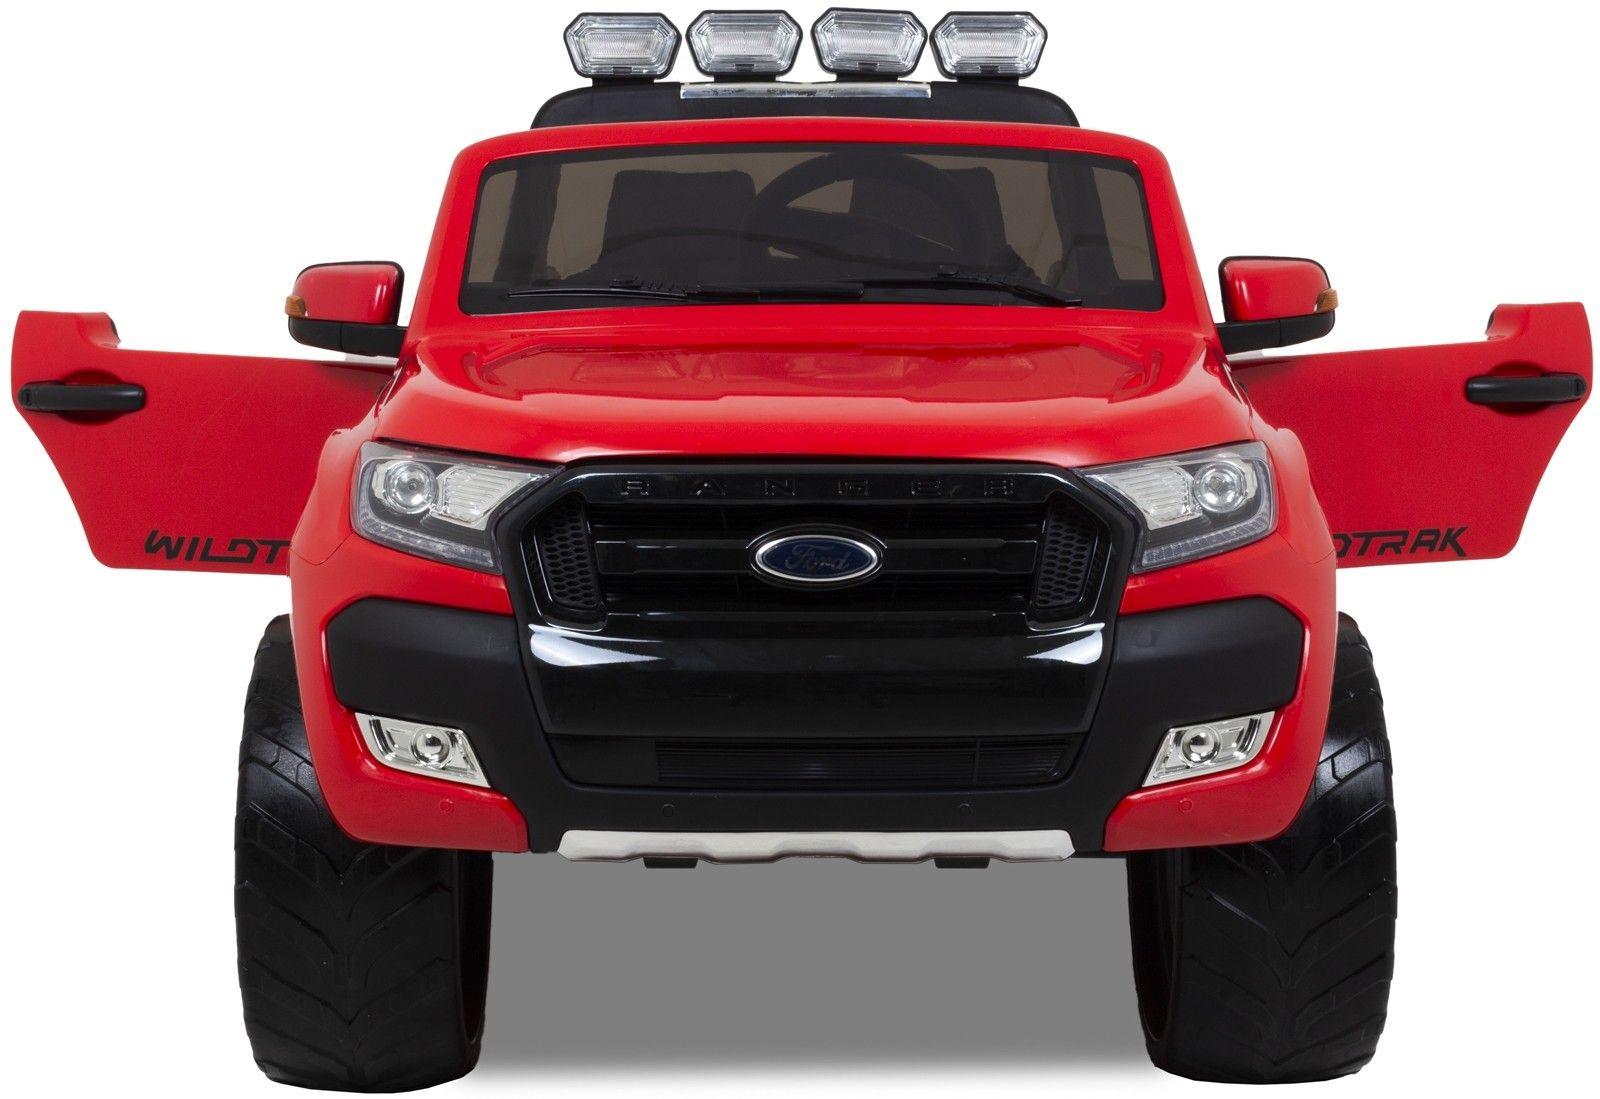 Image of Ford Ranger para niños rojo